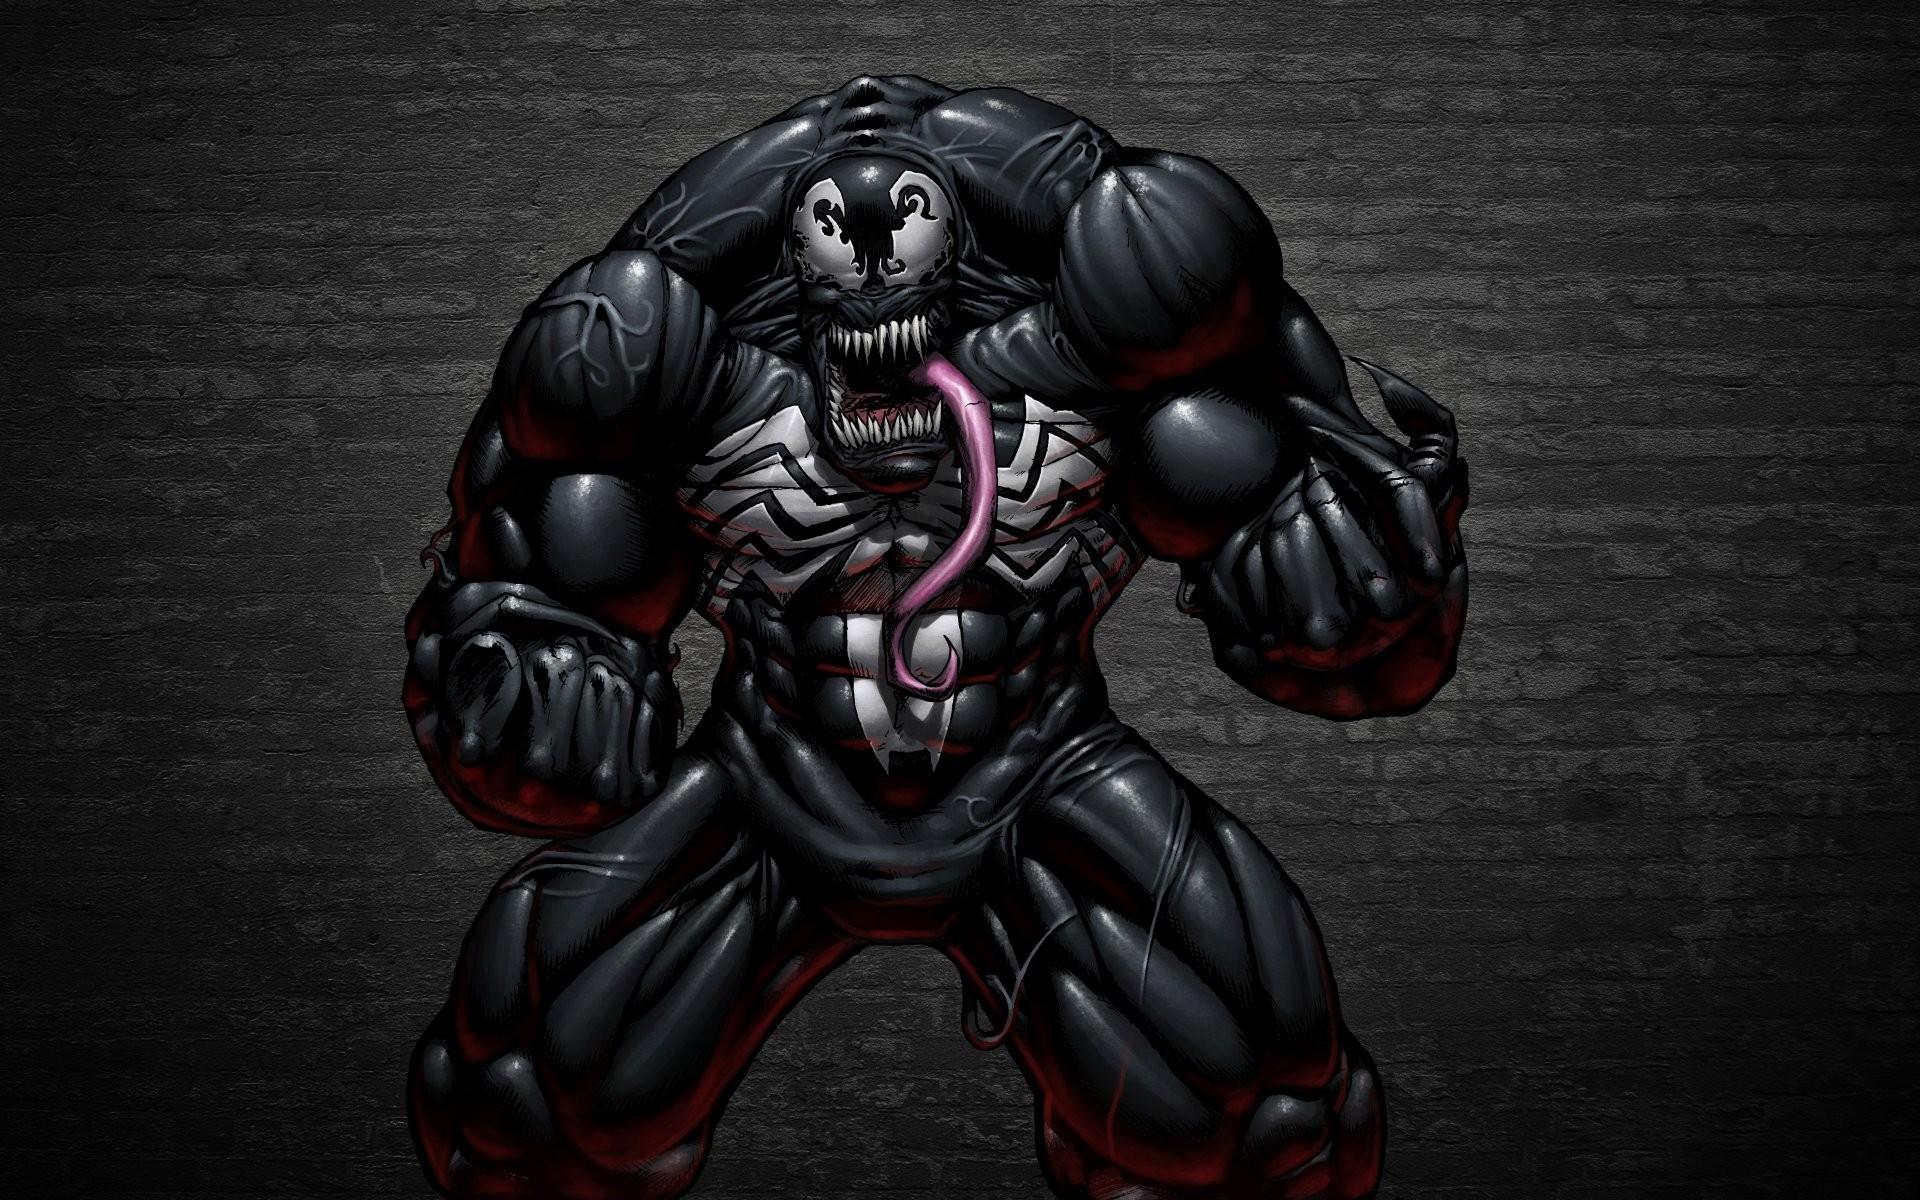 black spiderman 3d wallpaper